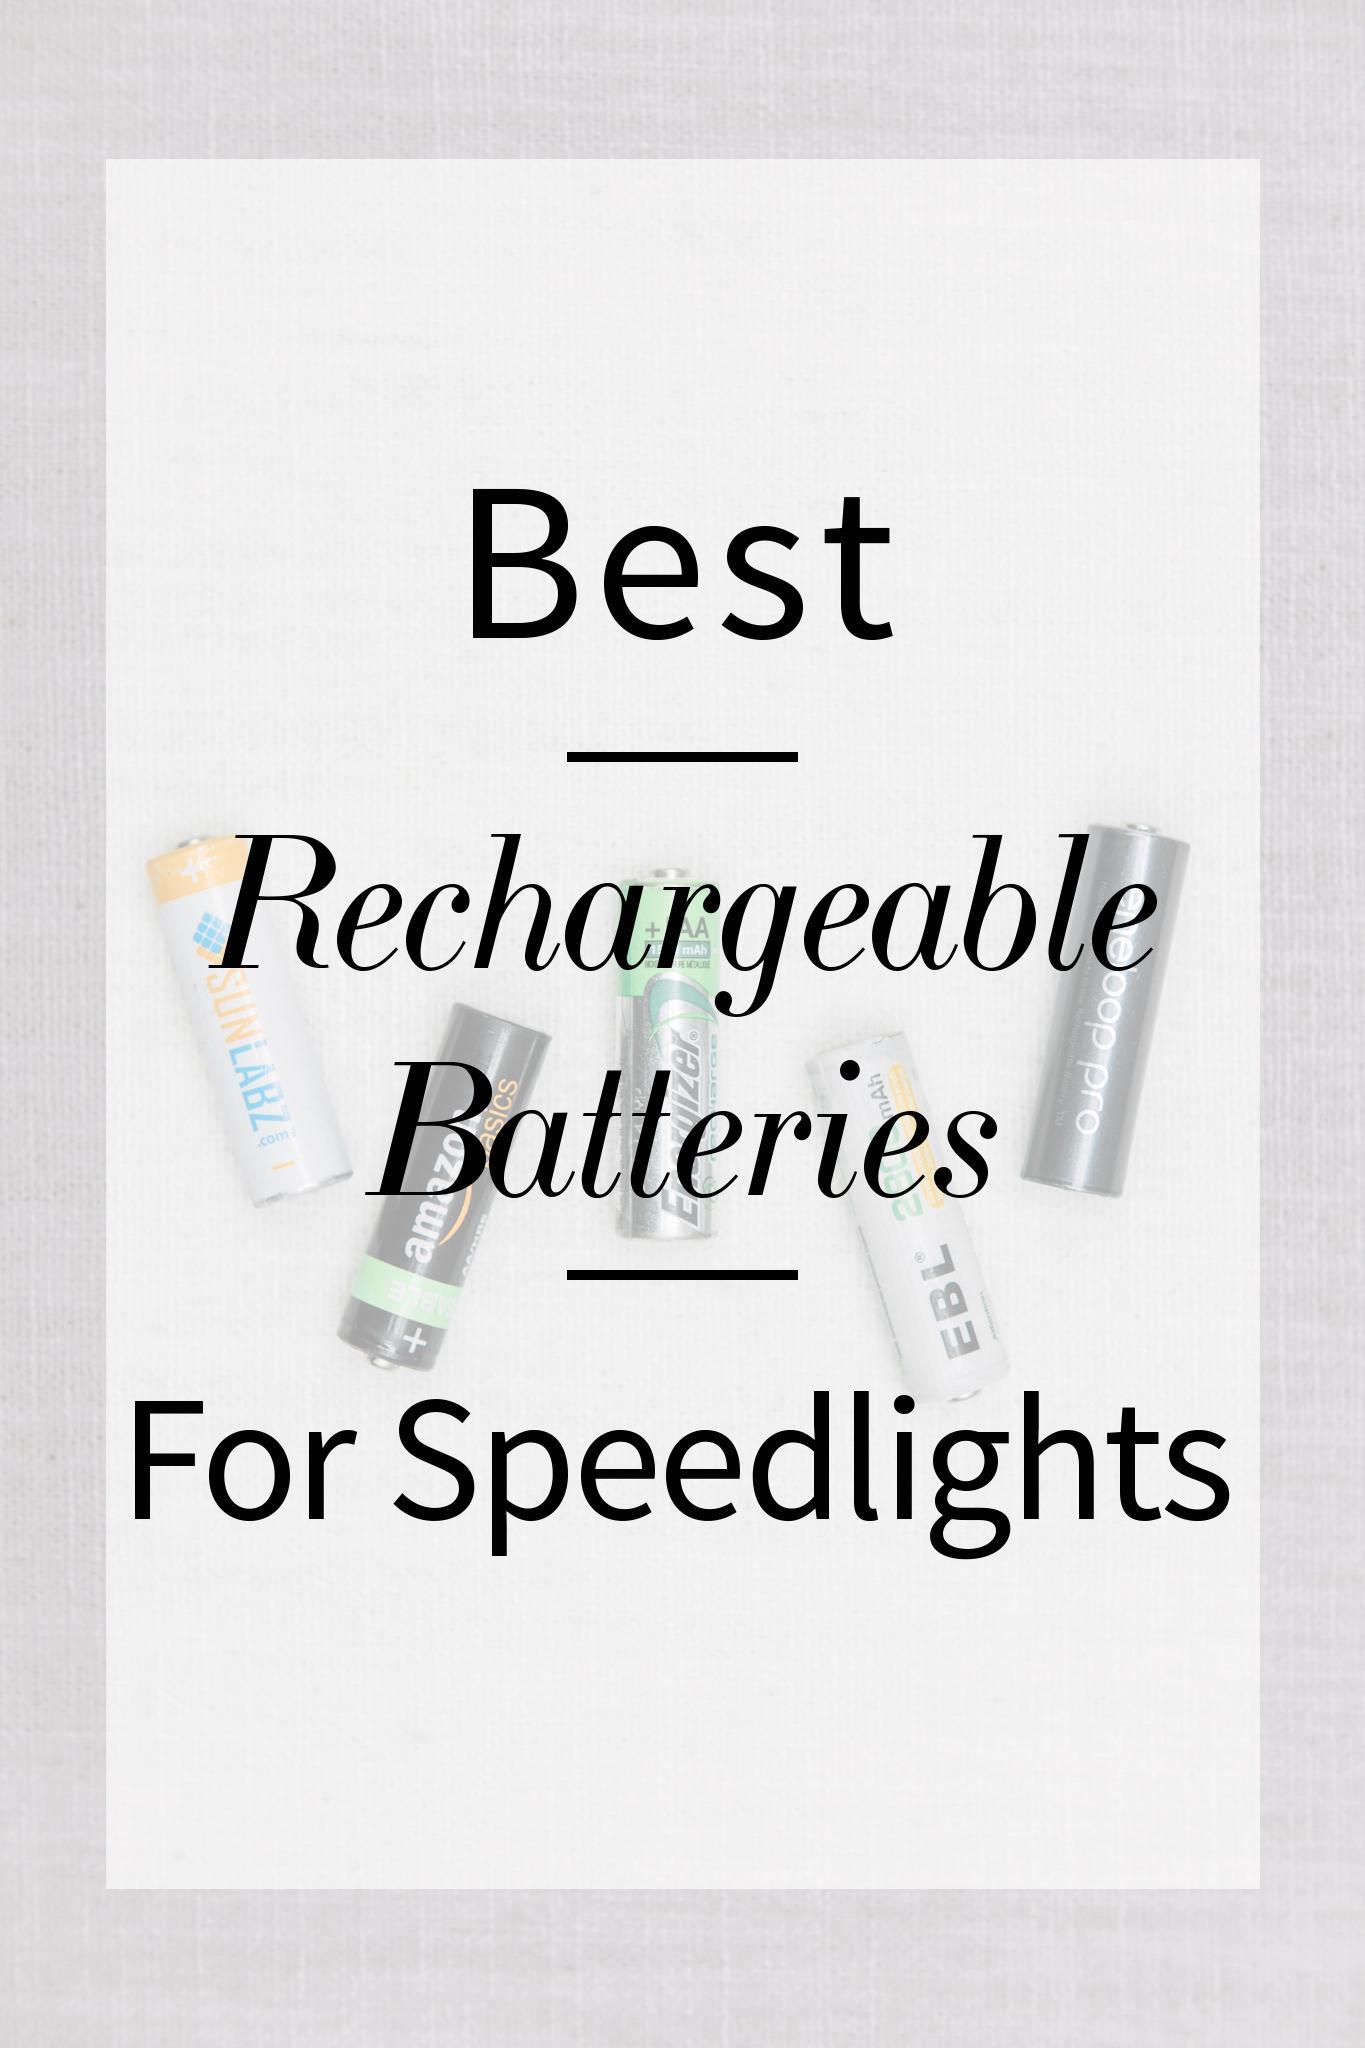 best-rechargeable-batteries-for-speedlights.jpg